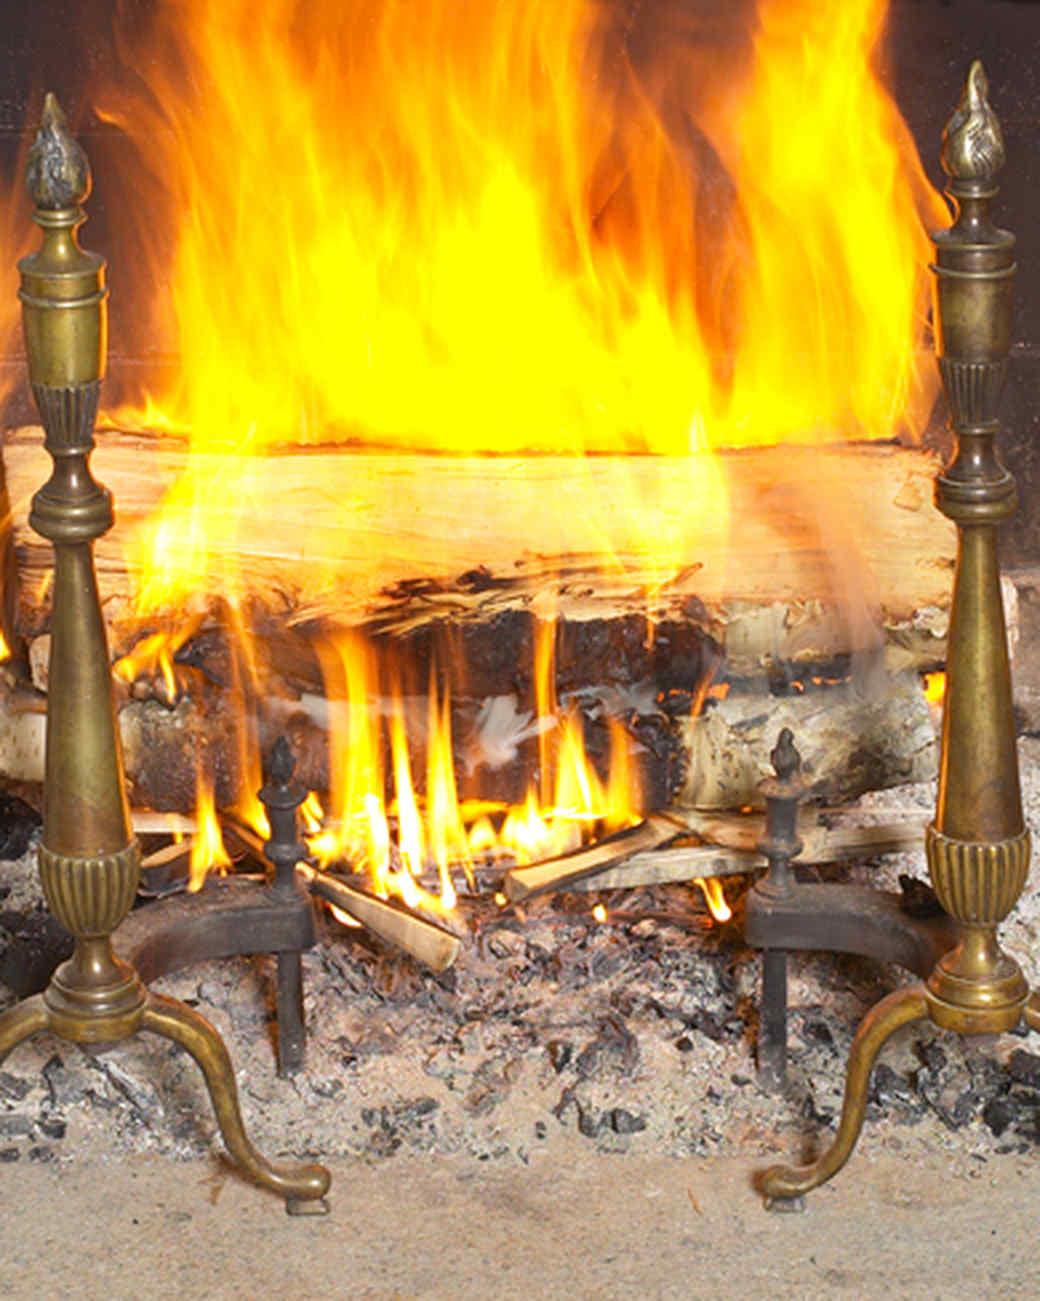 homekeeping_handbook_start_fire_122.jpg